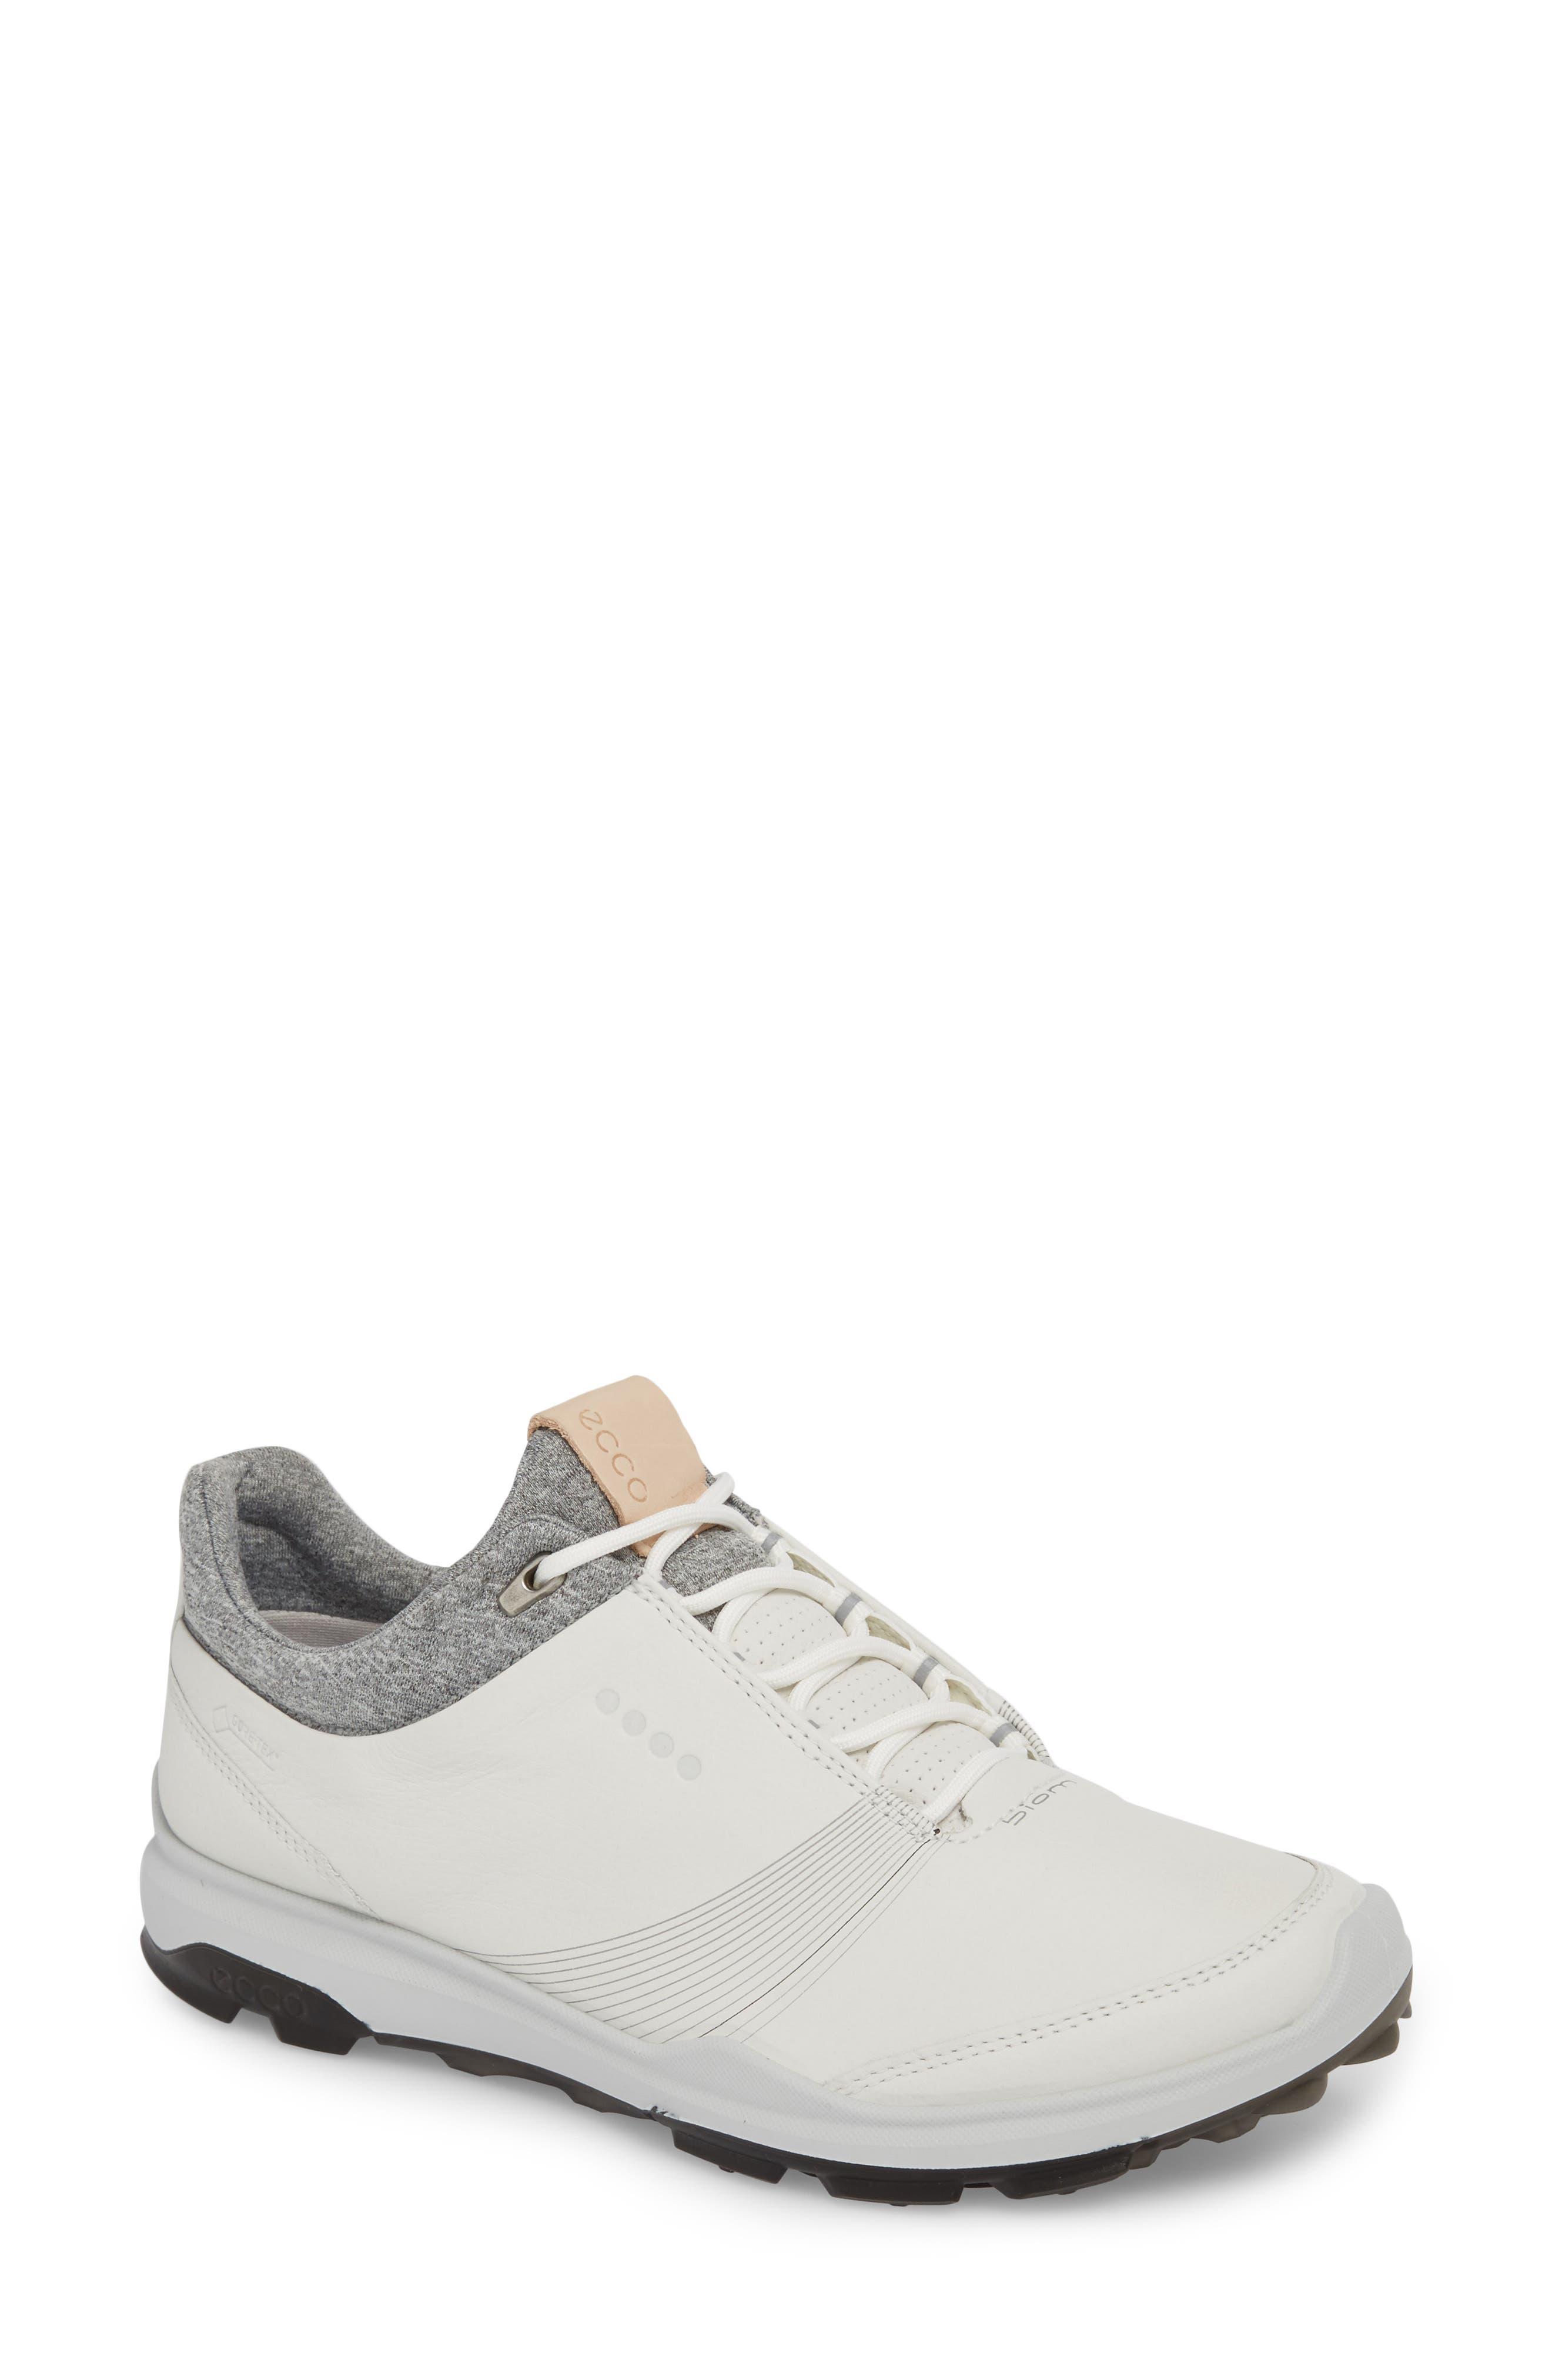 Ecco Biom Hybrid 3 Gtx Golf Shoe, White